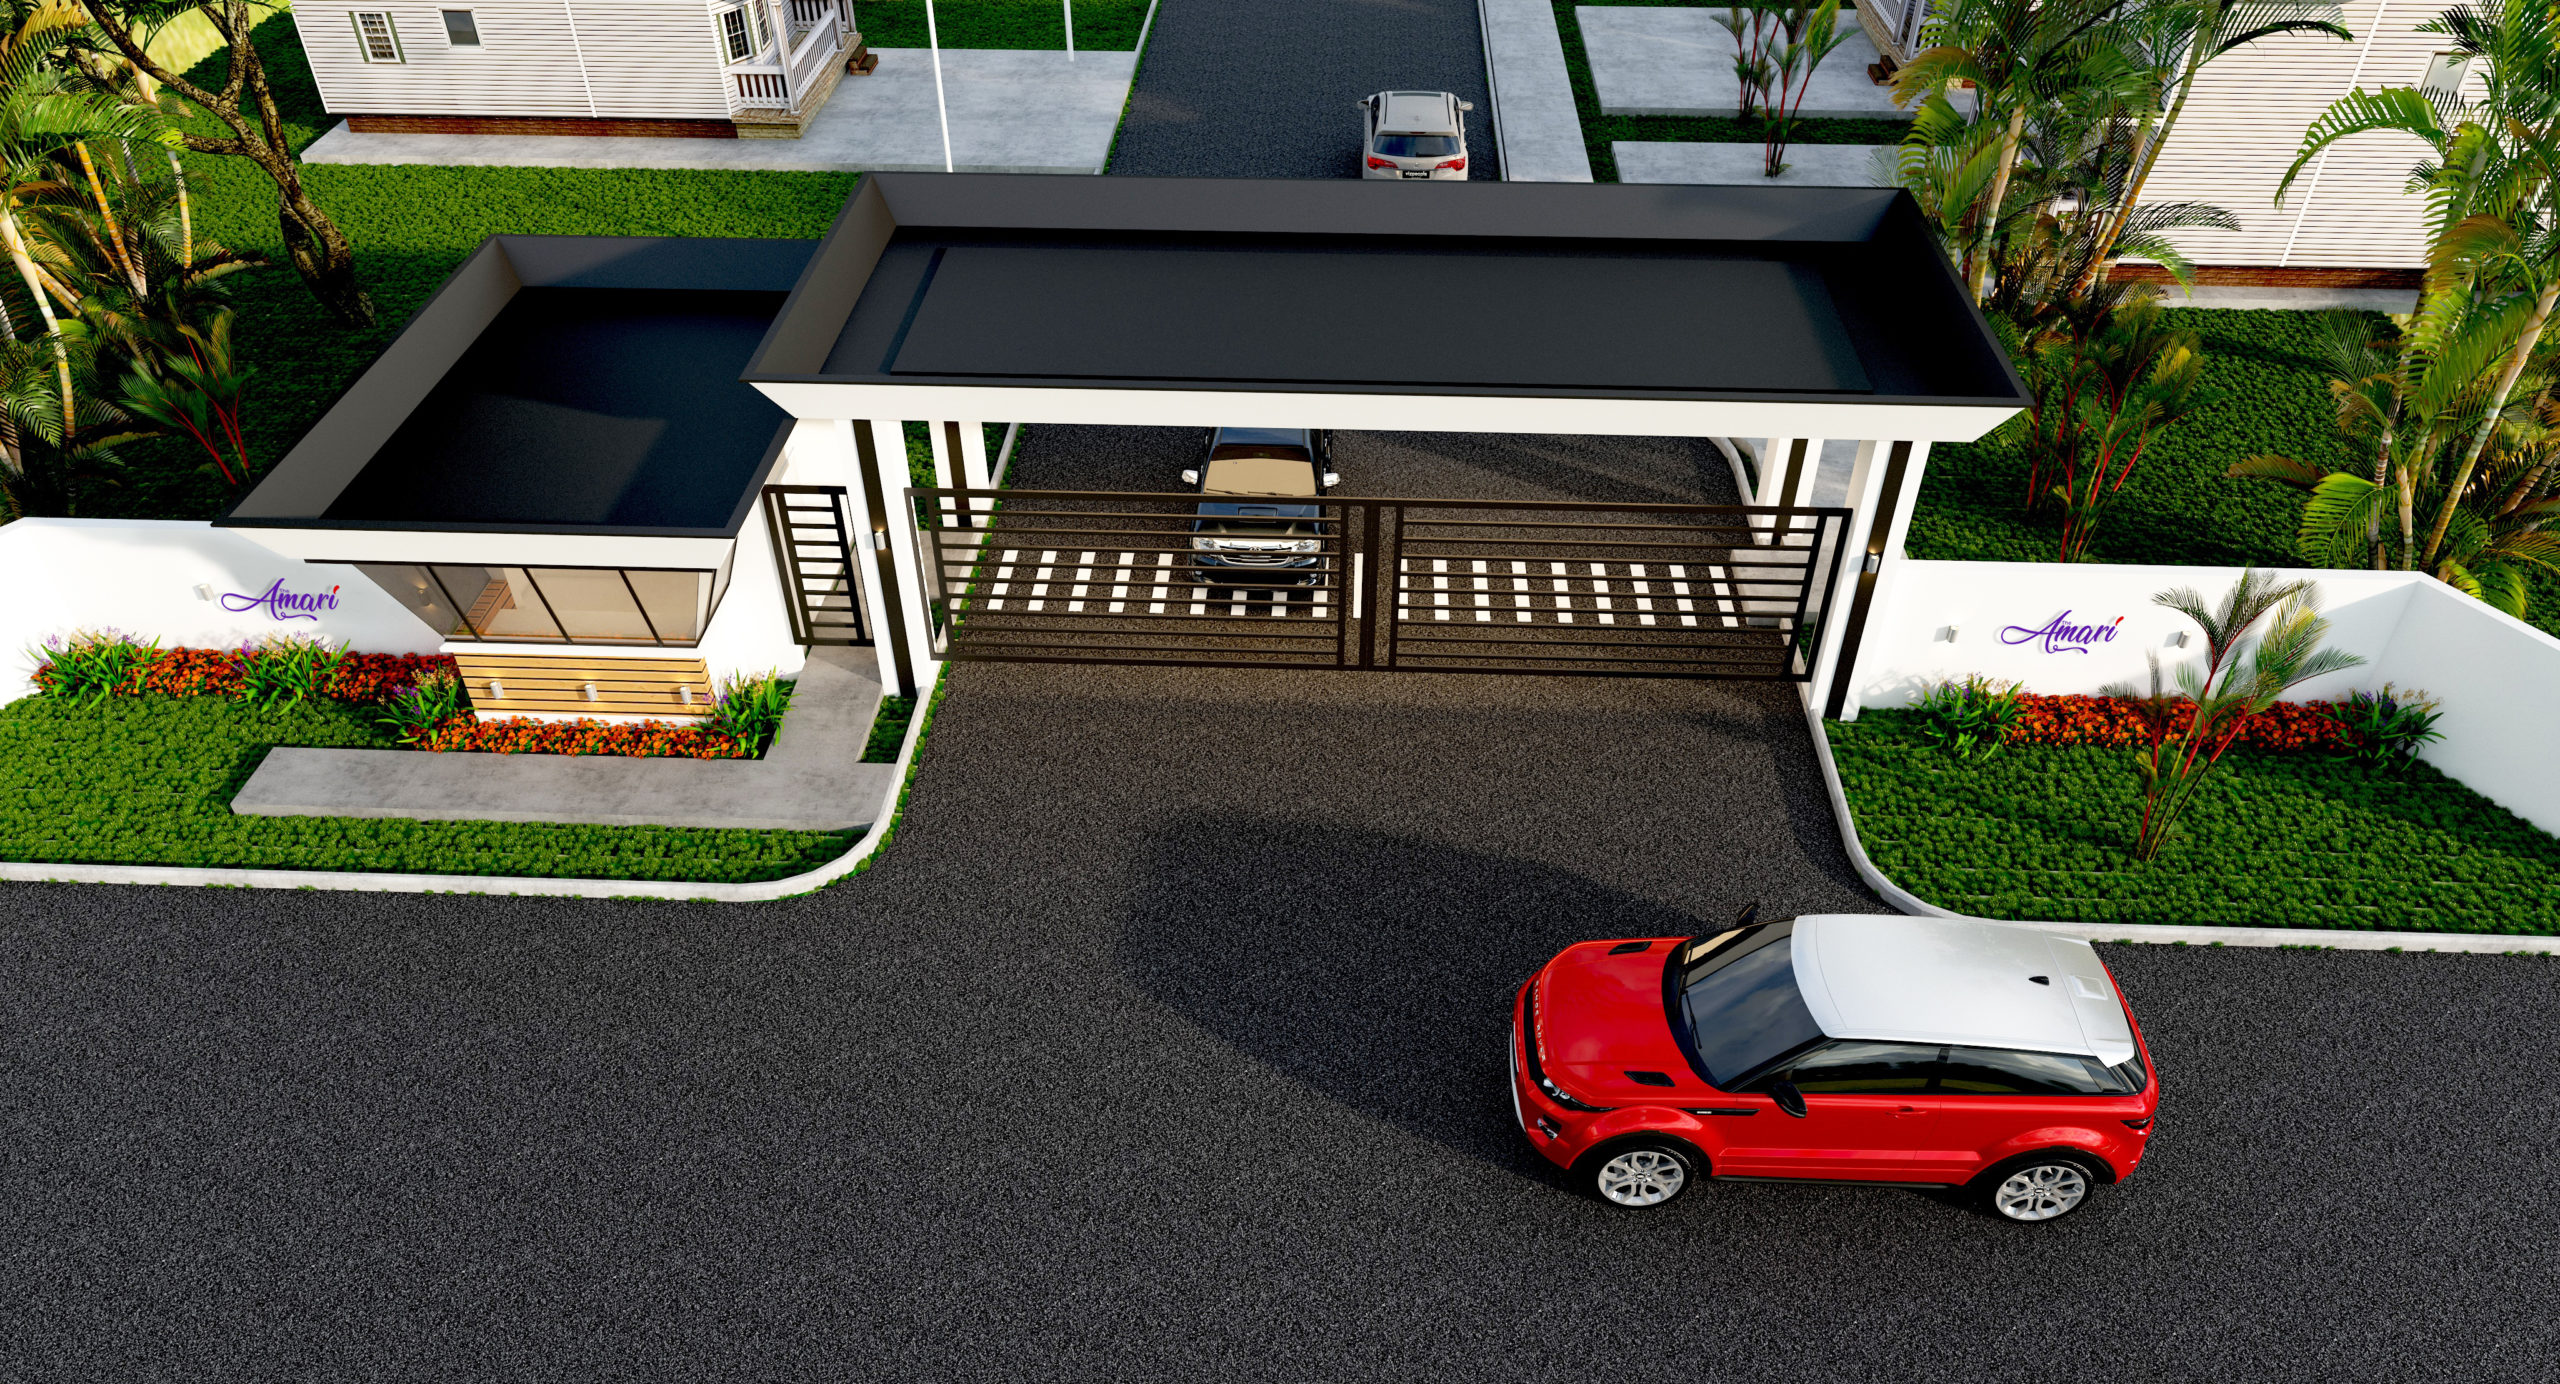 https://theamari.com/wp-content/uploads/2020/10/new-gate-house-vaERIAL-1-scaled.jpg